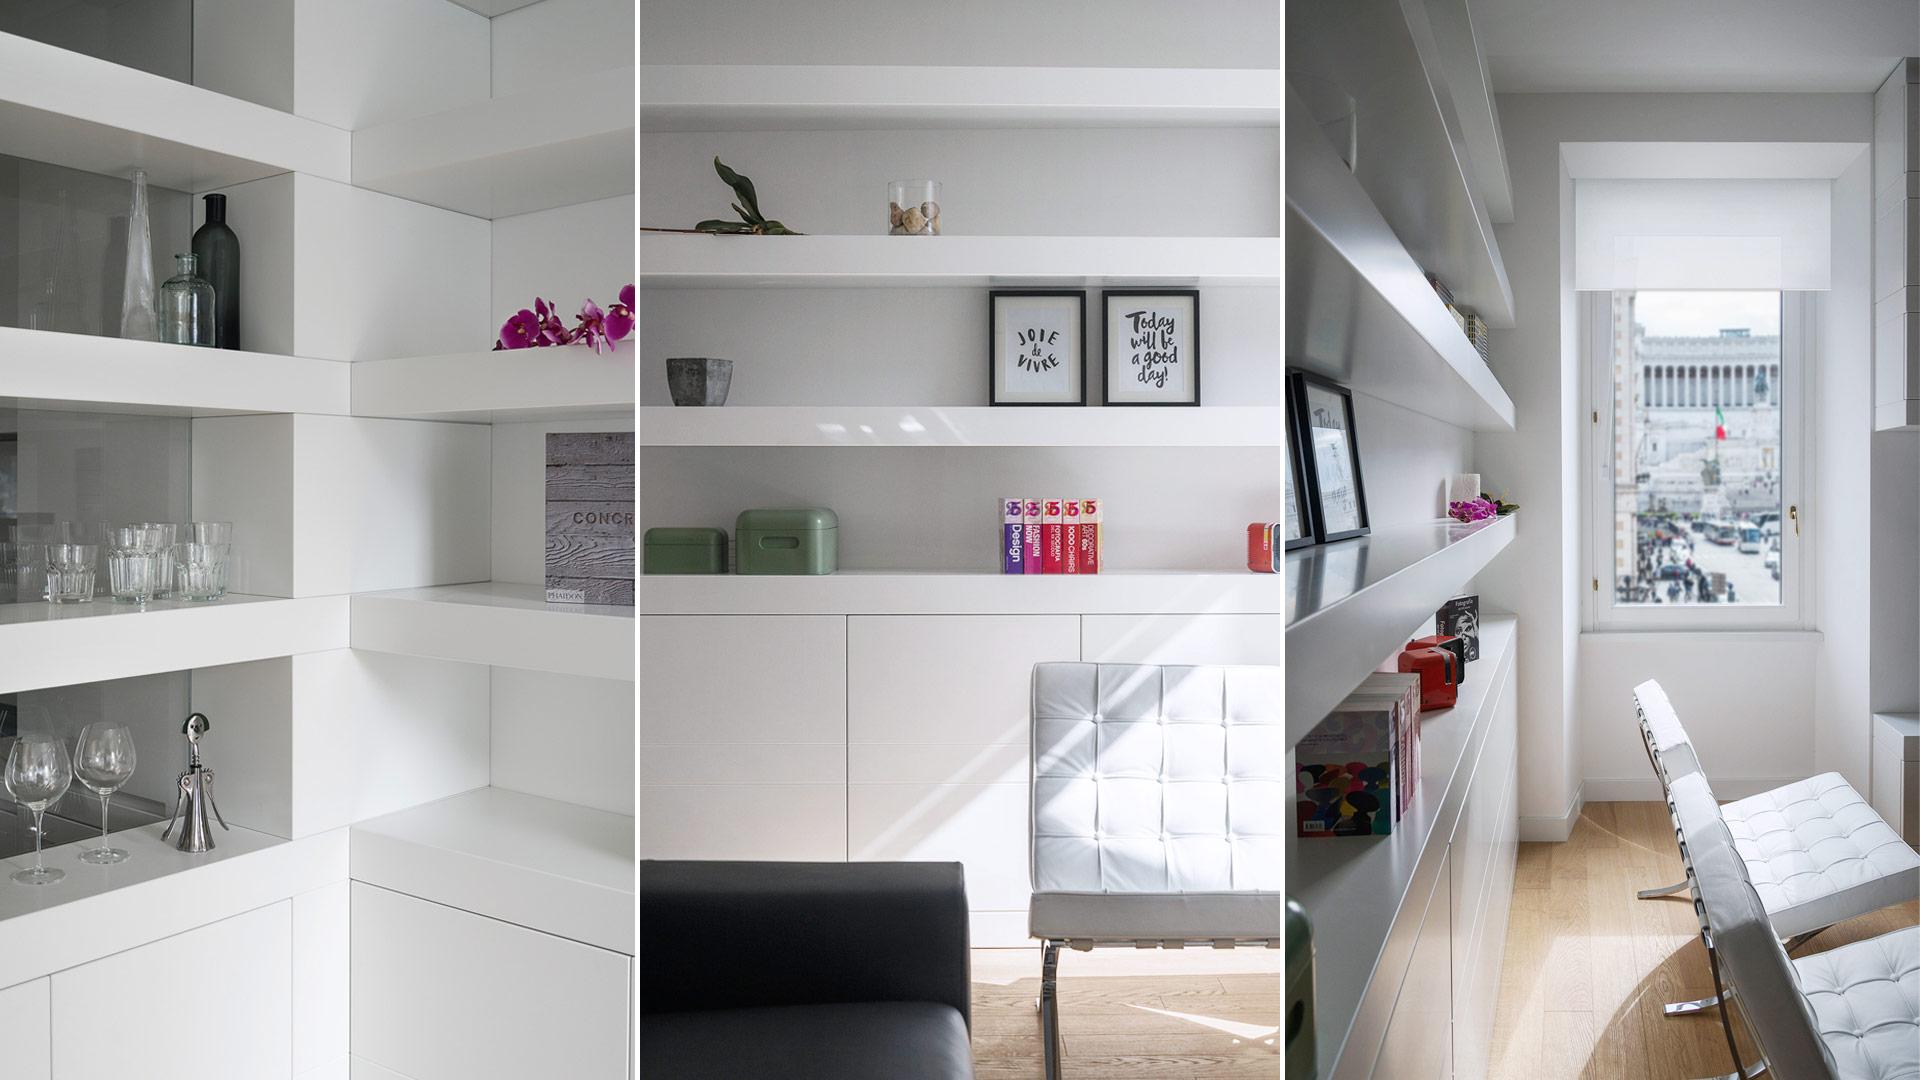 Interior: Private apartment in Rome with a simple, unique and functional design - TM Italia - Area-contract-Cicchetti-06